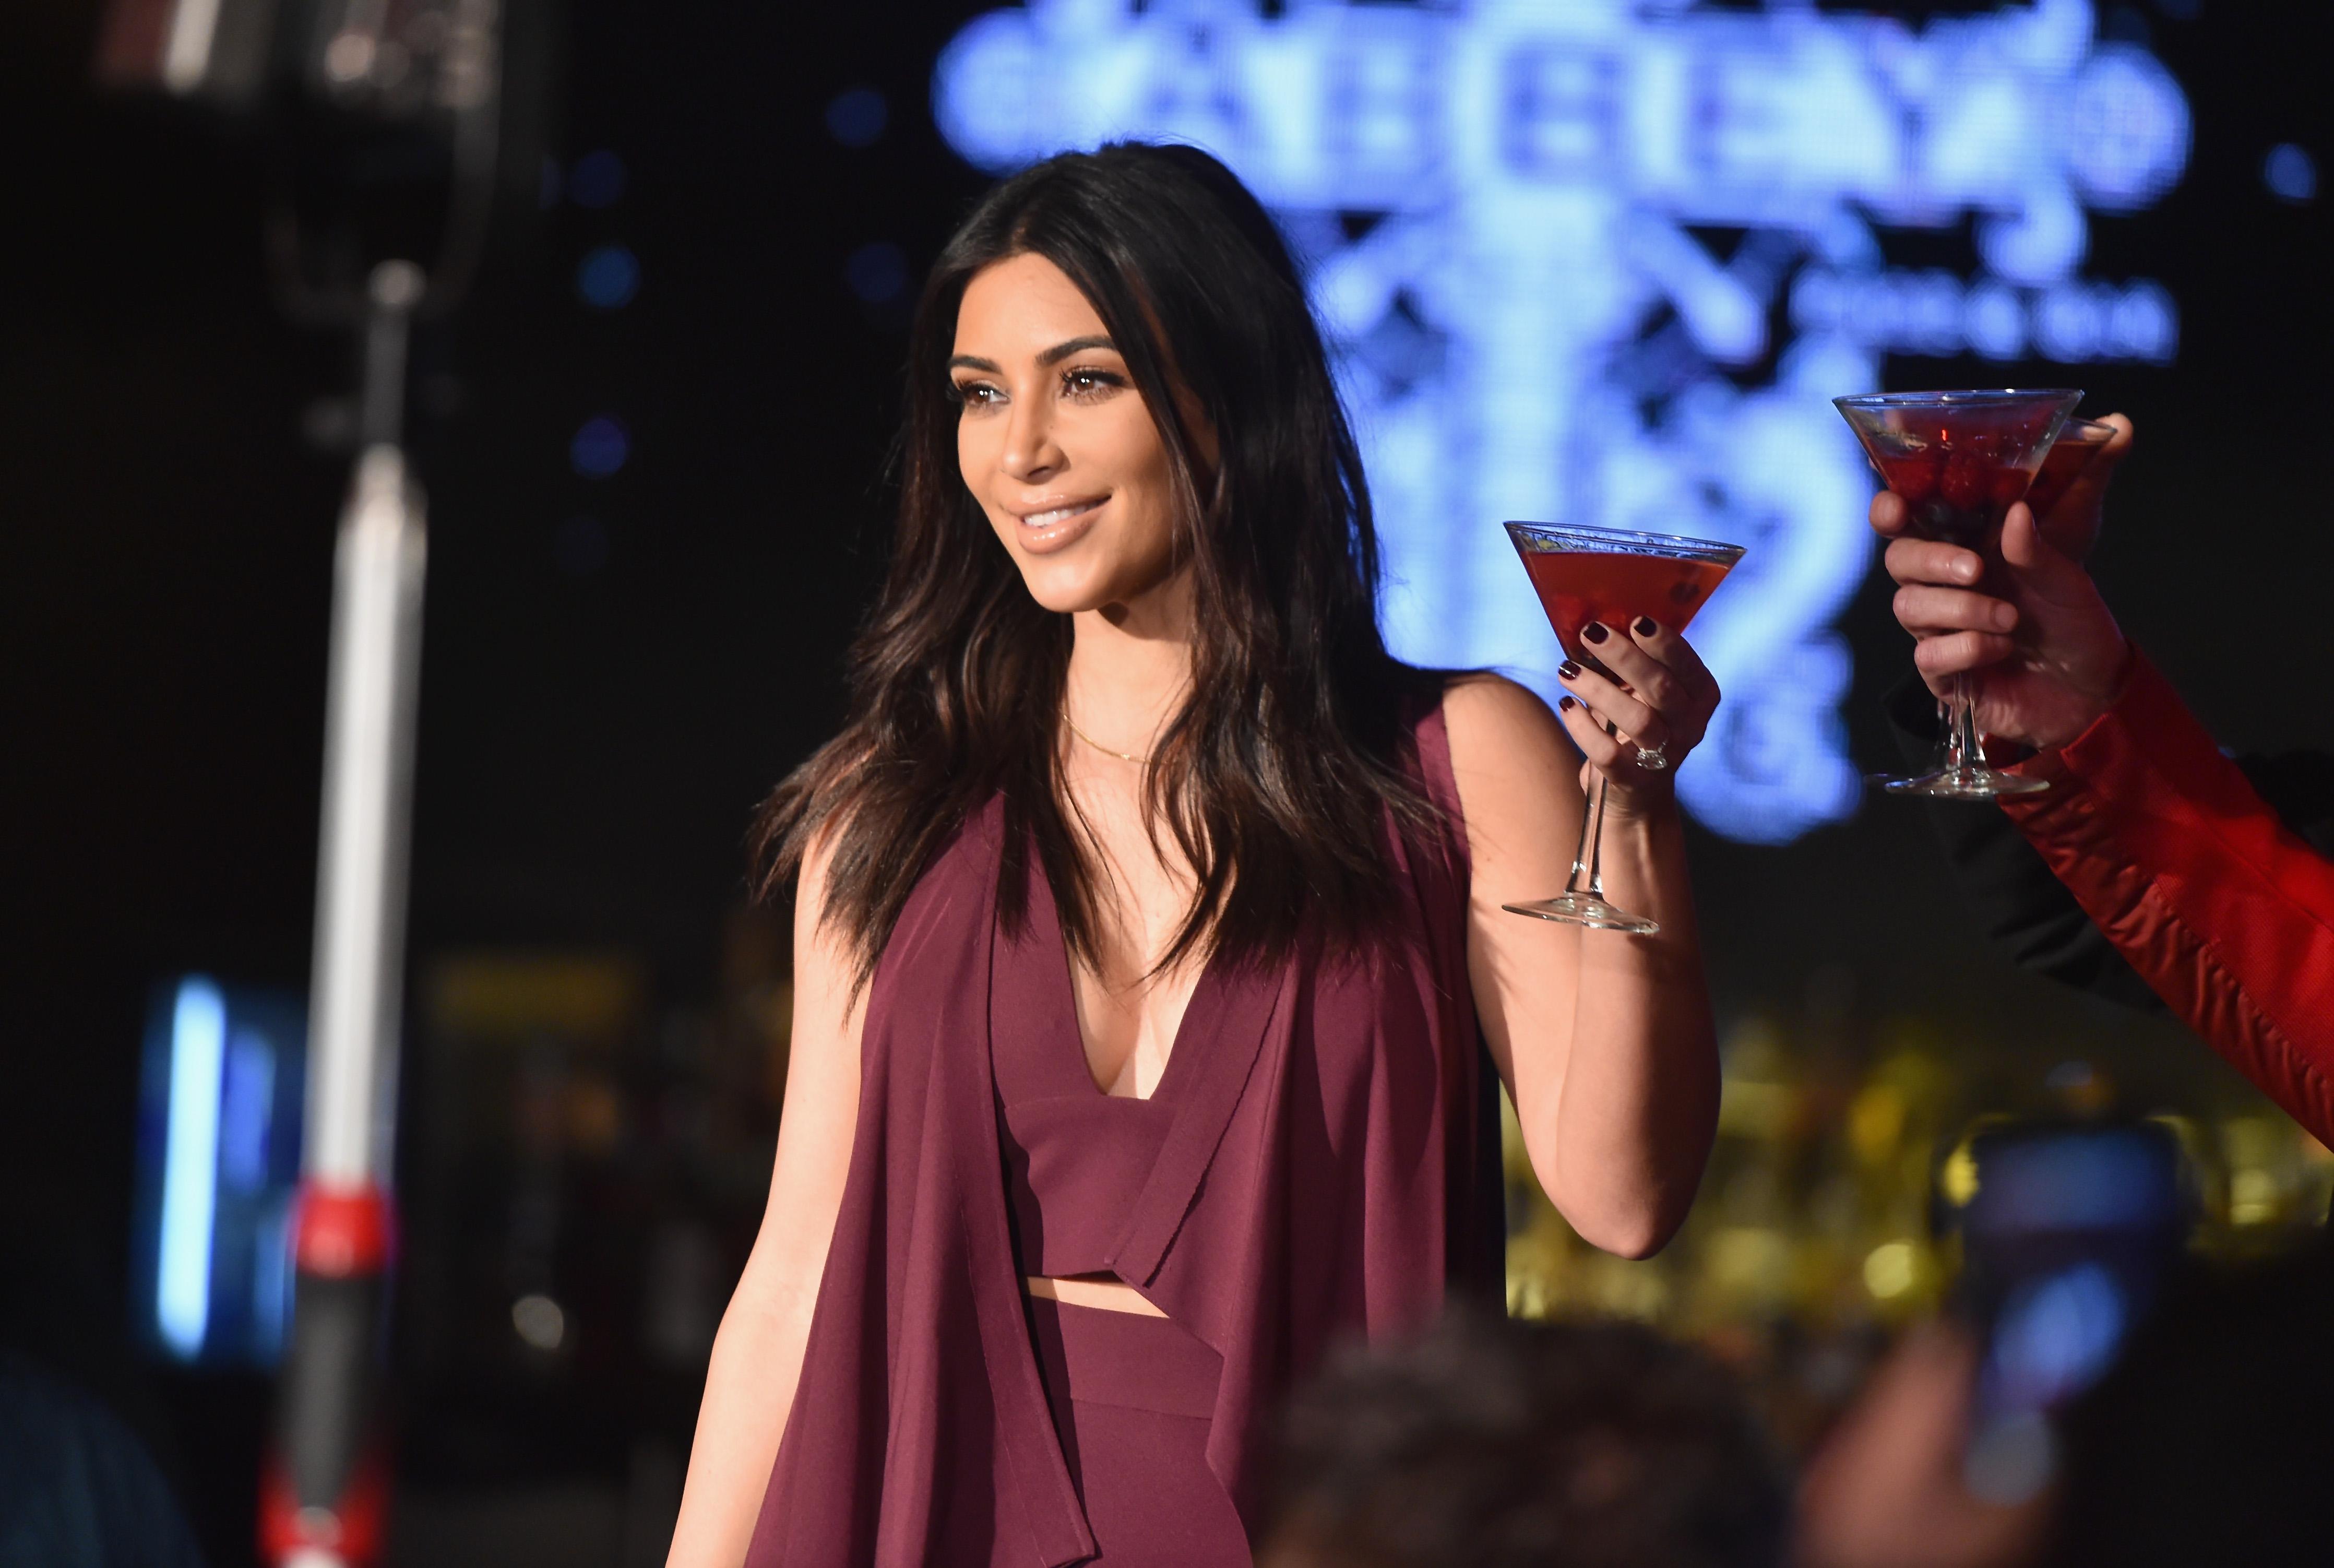 Kim Kardashian Raises Toast For Elizabeth Taylor Foundation/World AIDS Day At The Abbey